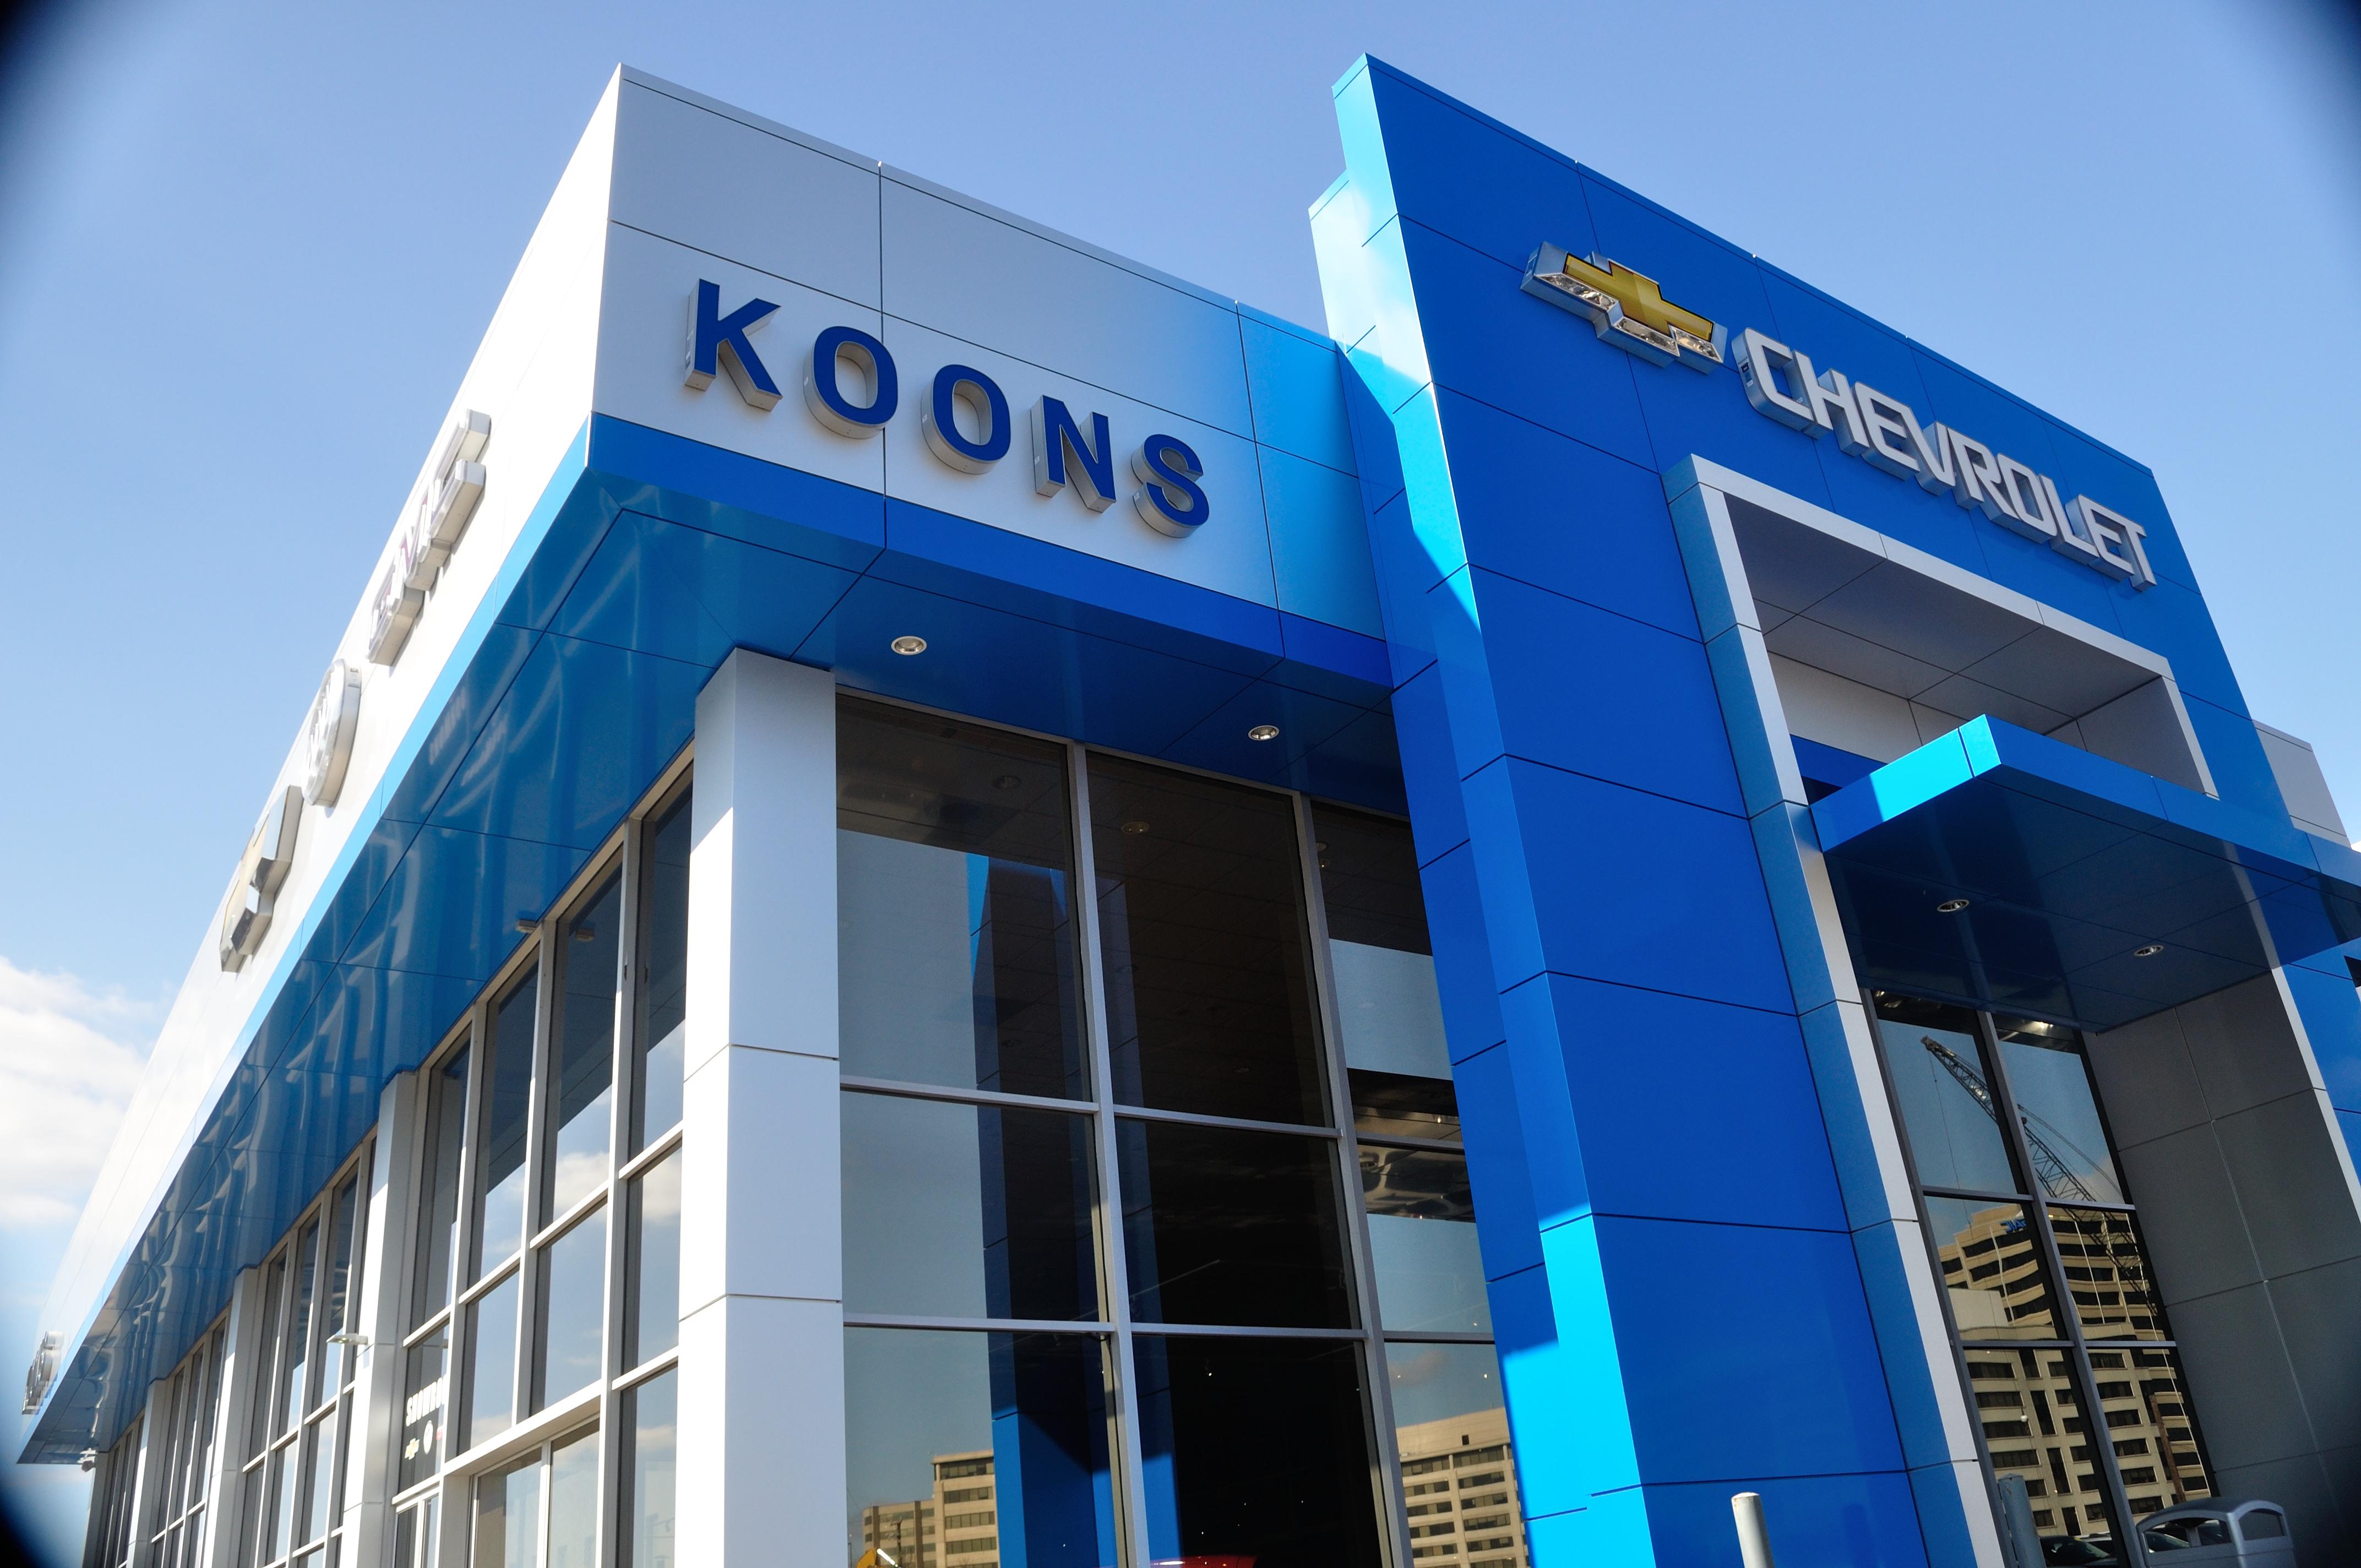 Chevrolet Krystal Koons